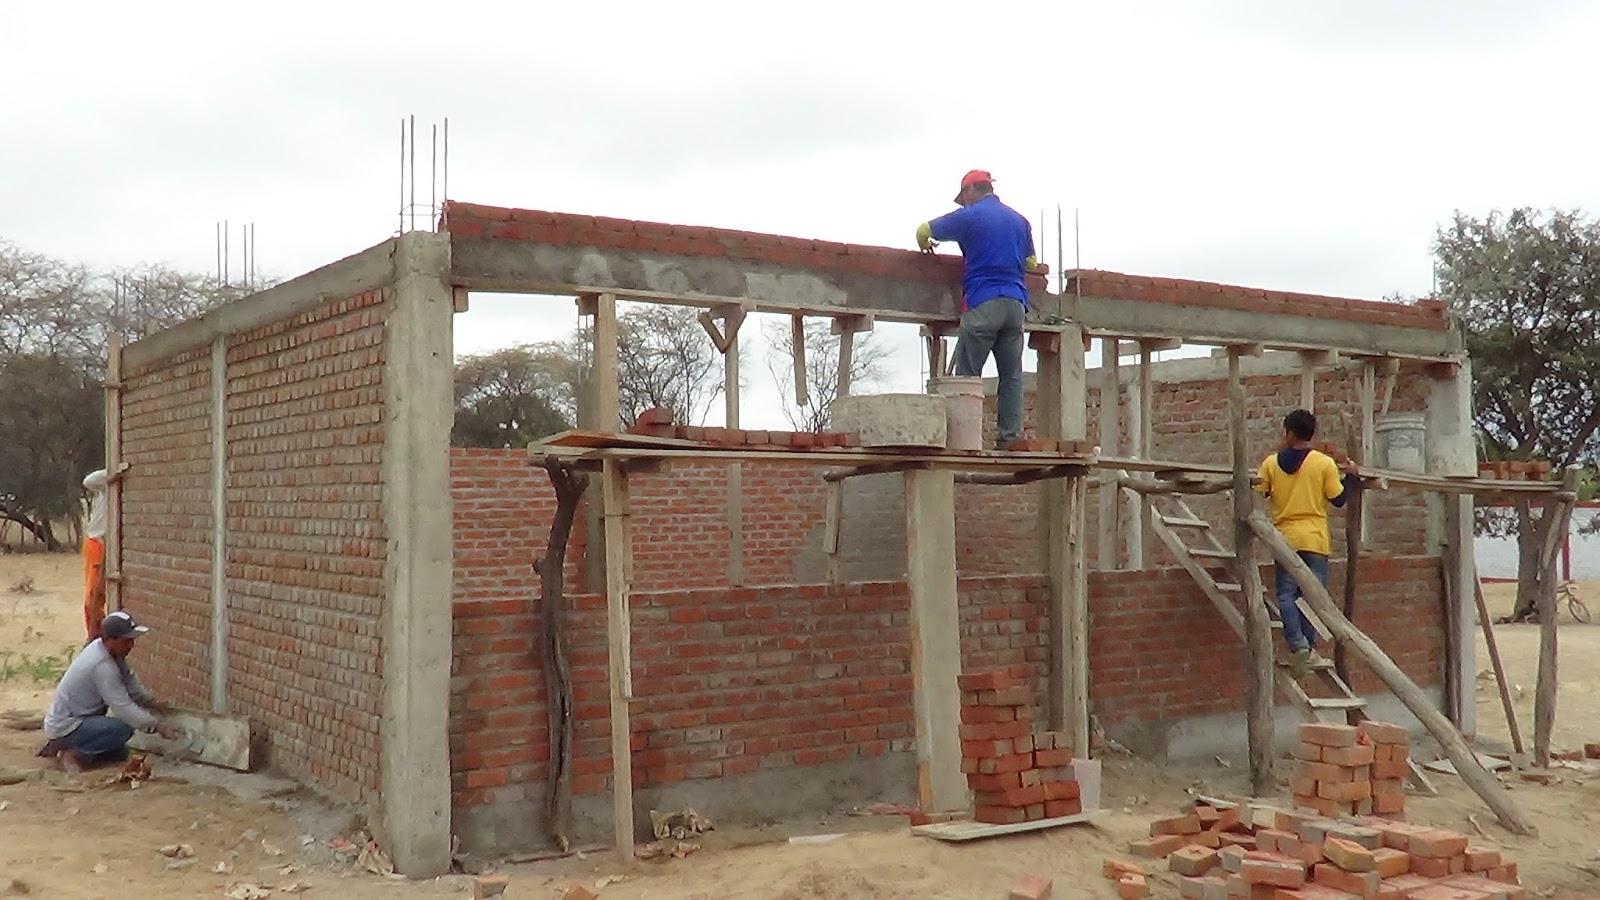 Municipalidad distrital de la matanza construye aula for Municipalidad la matanza